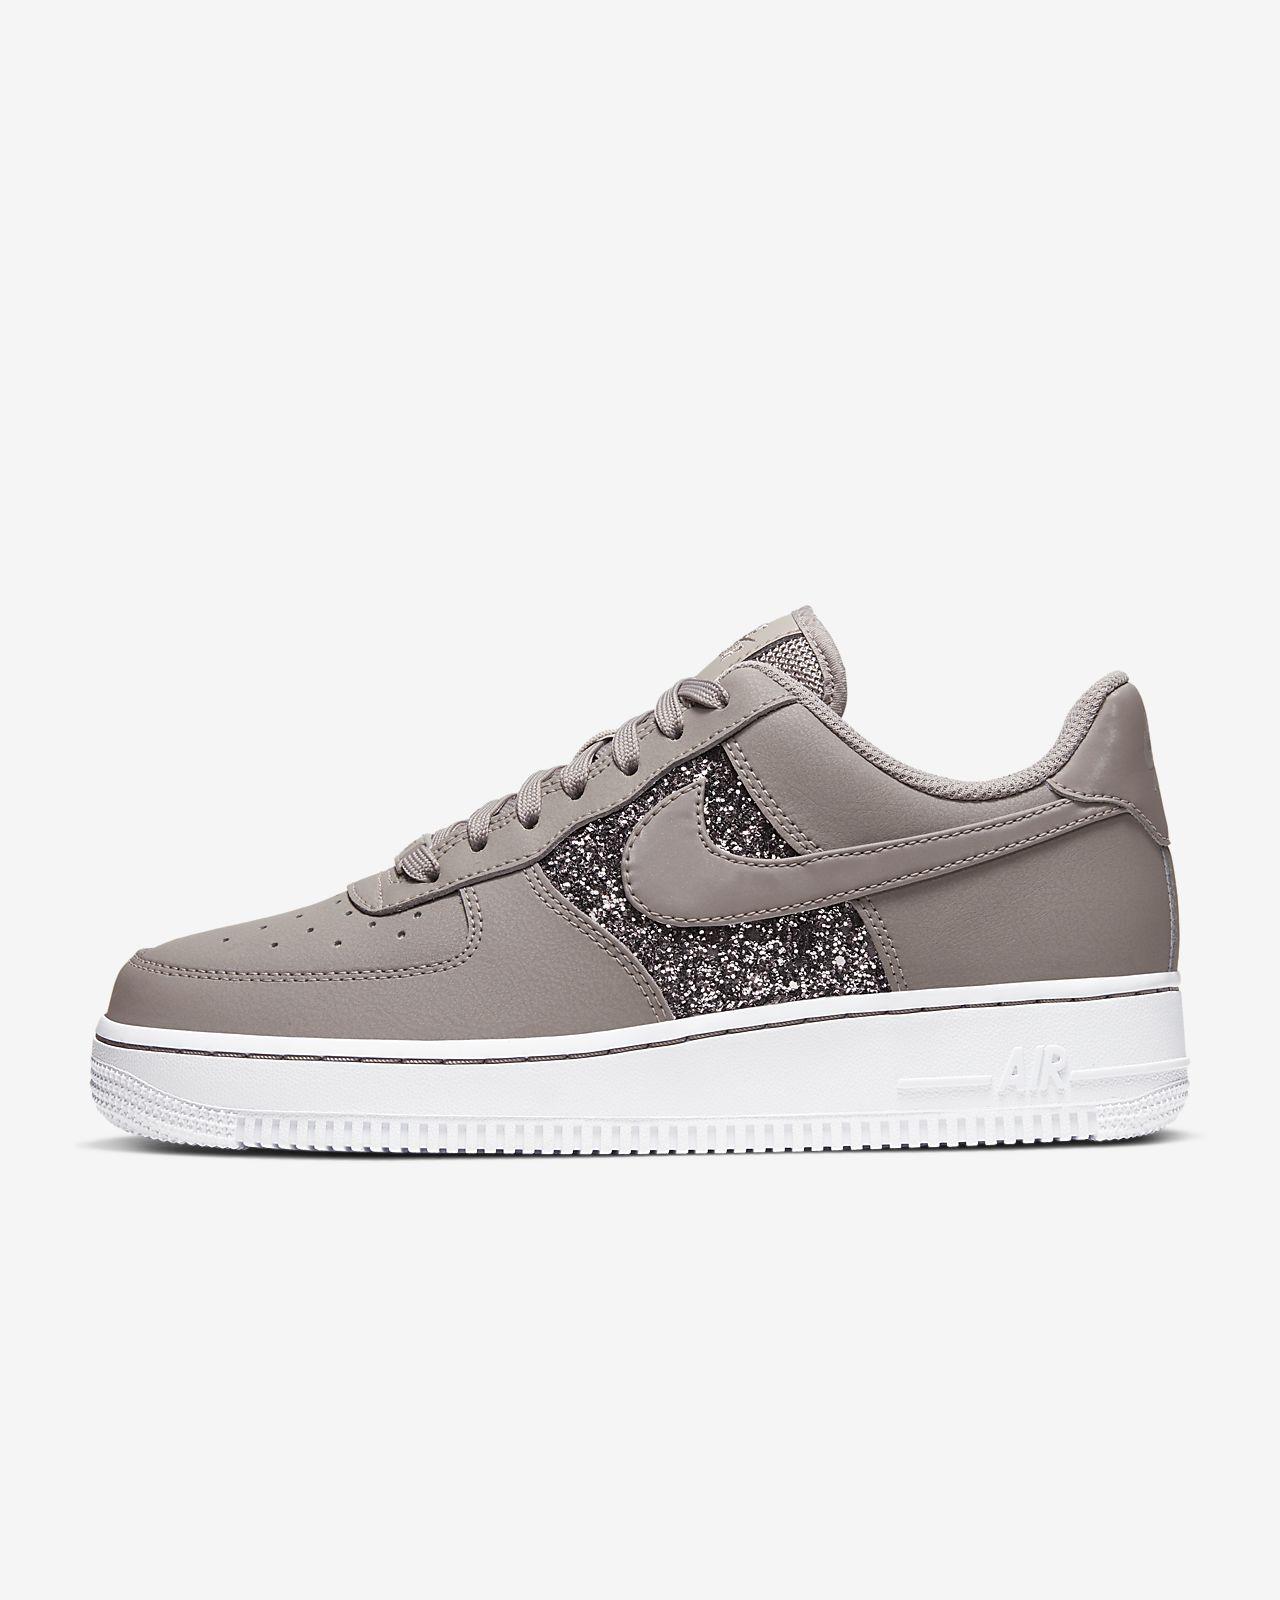 Calzado Glitter para mujer Nike Air Force 1 Low